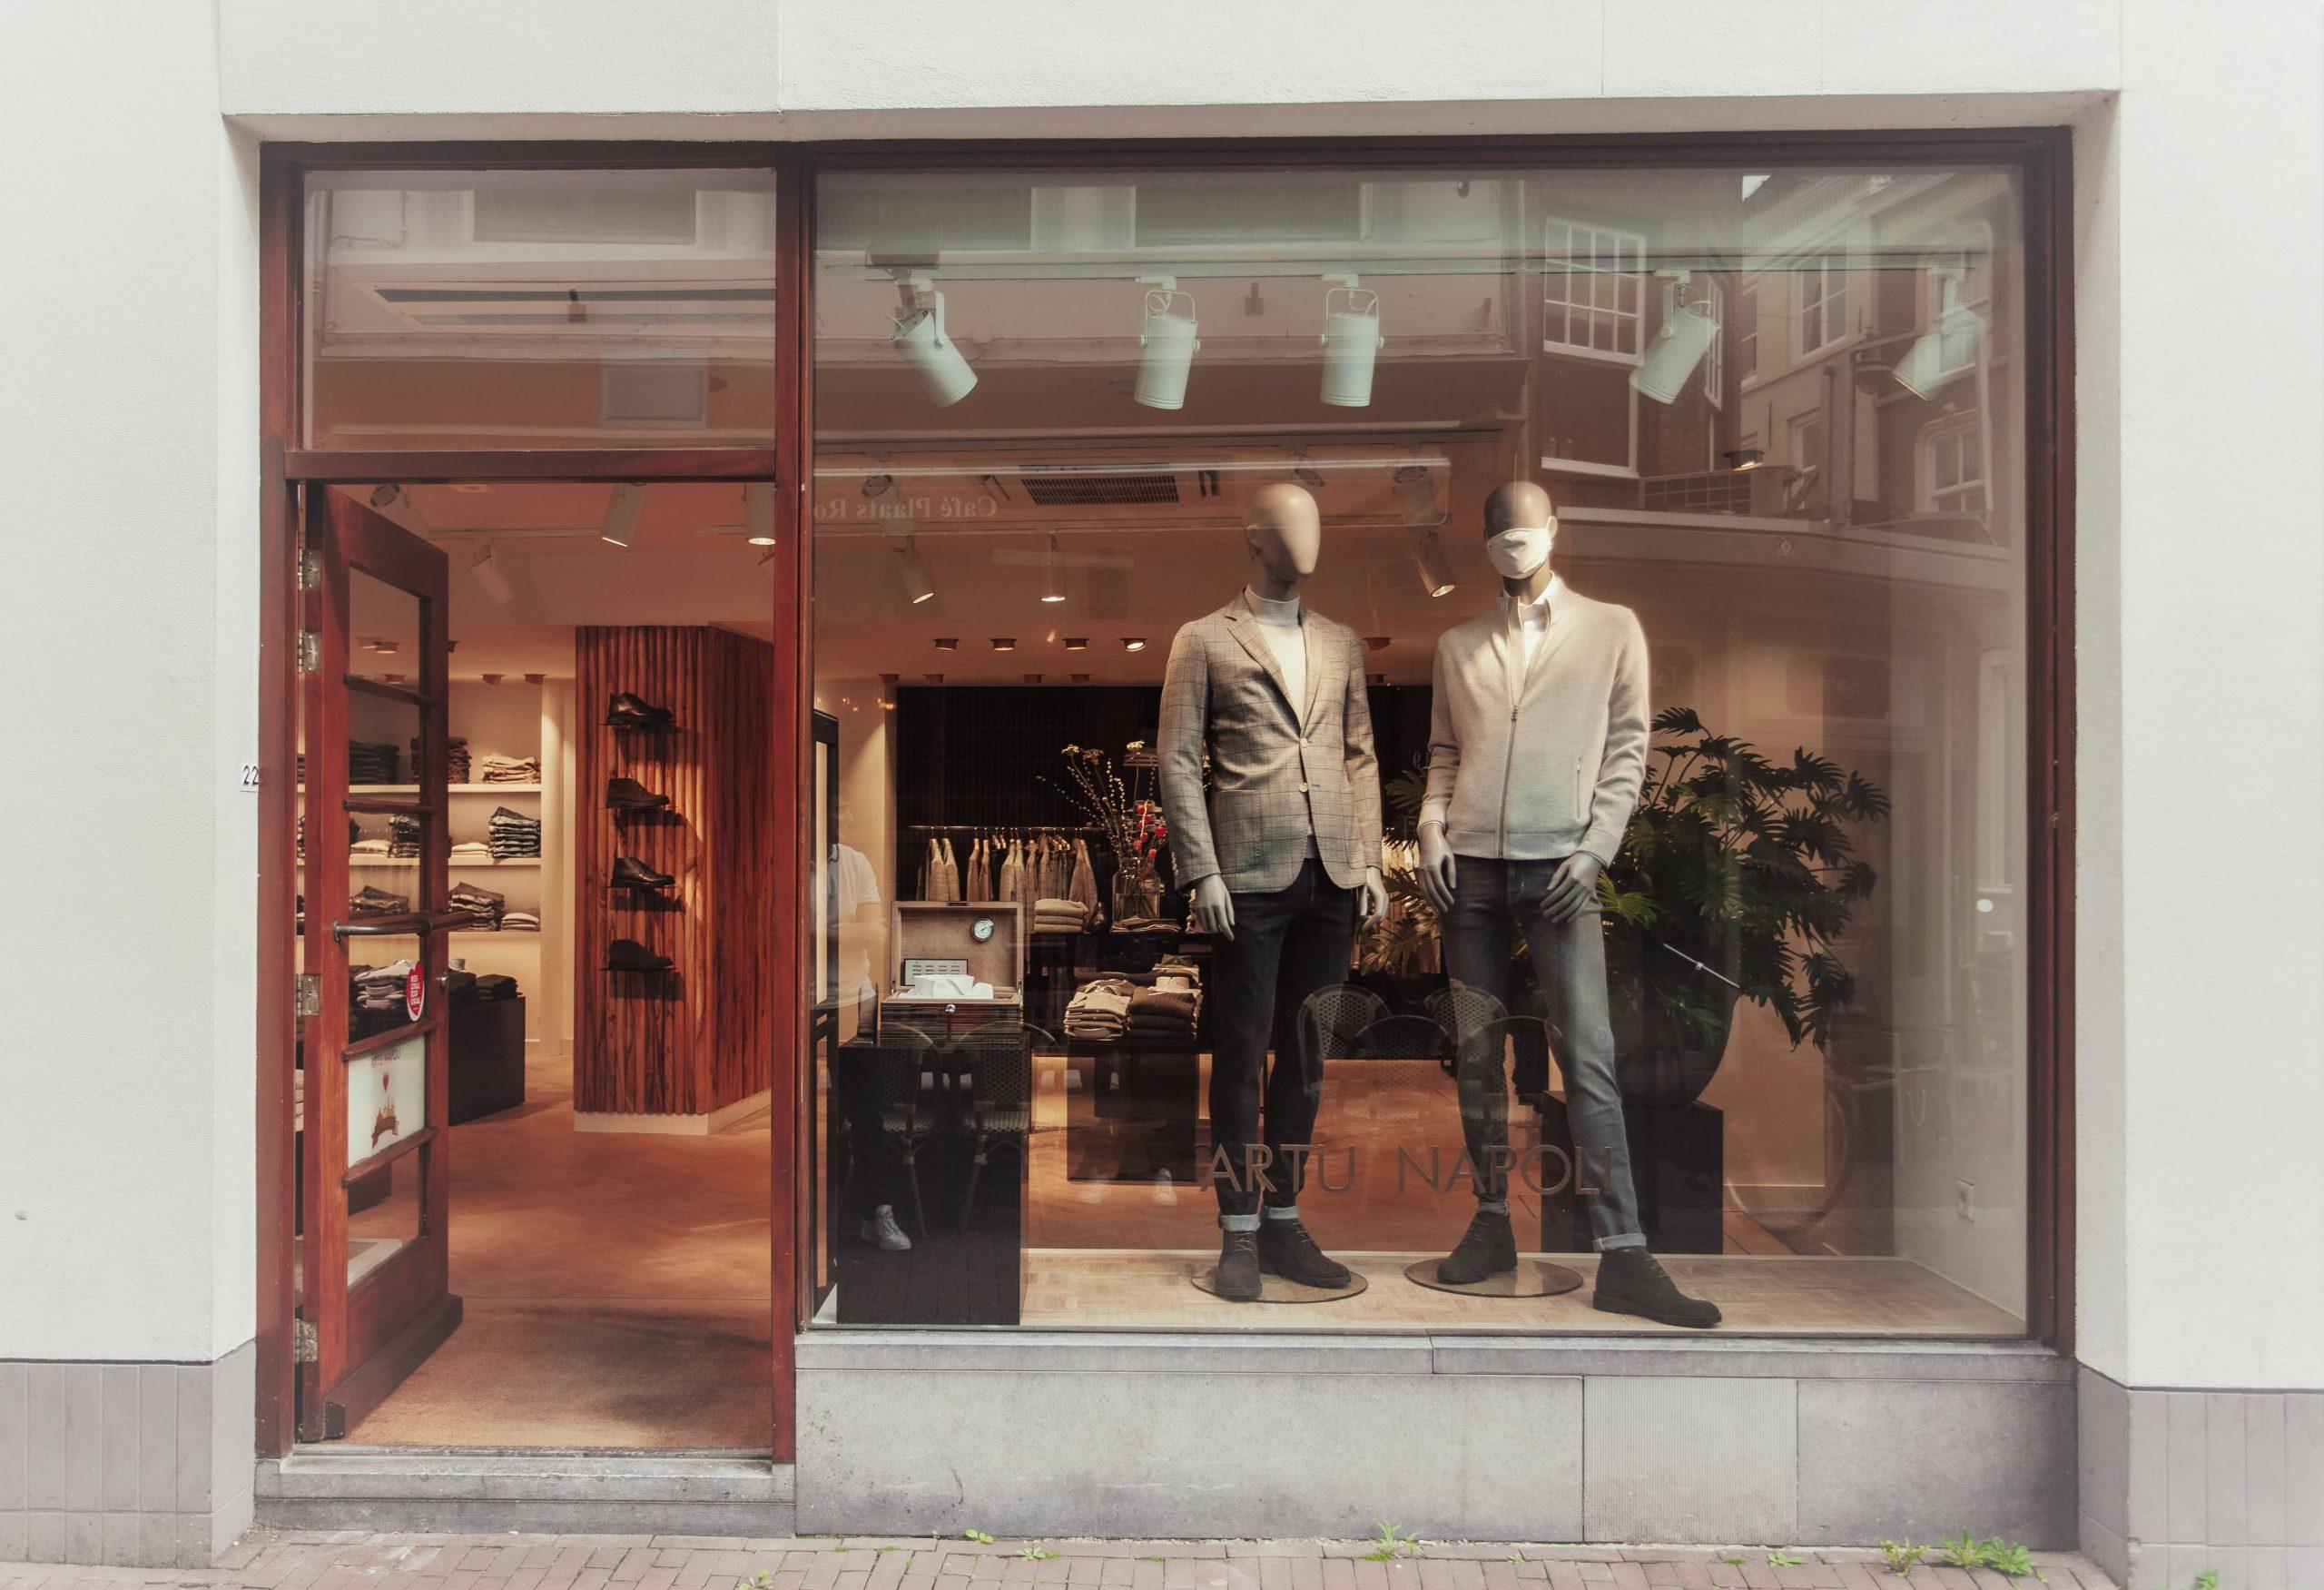 Artu Napoli Winkel Den Bosch